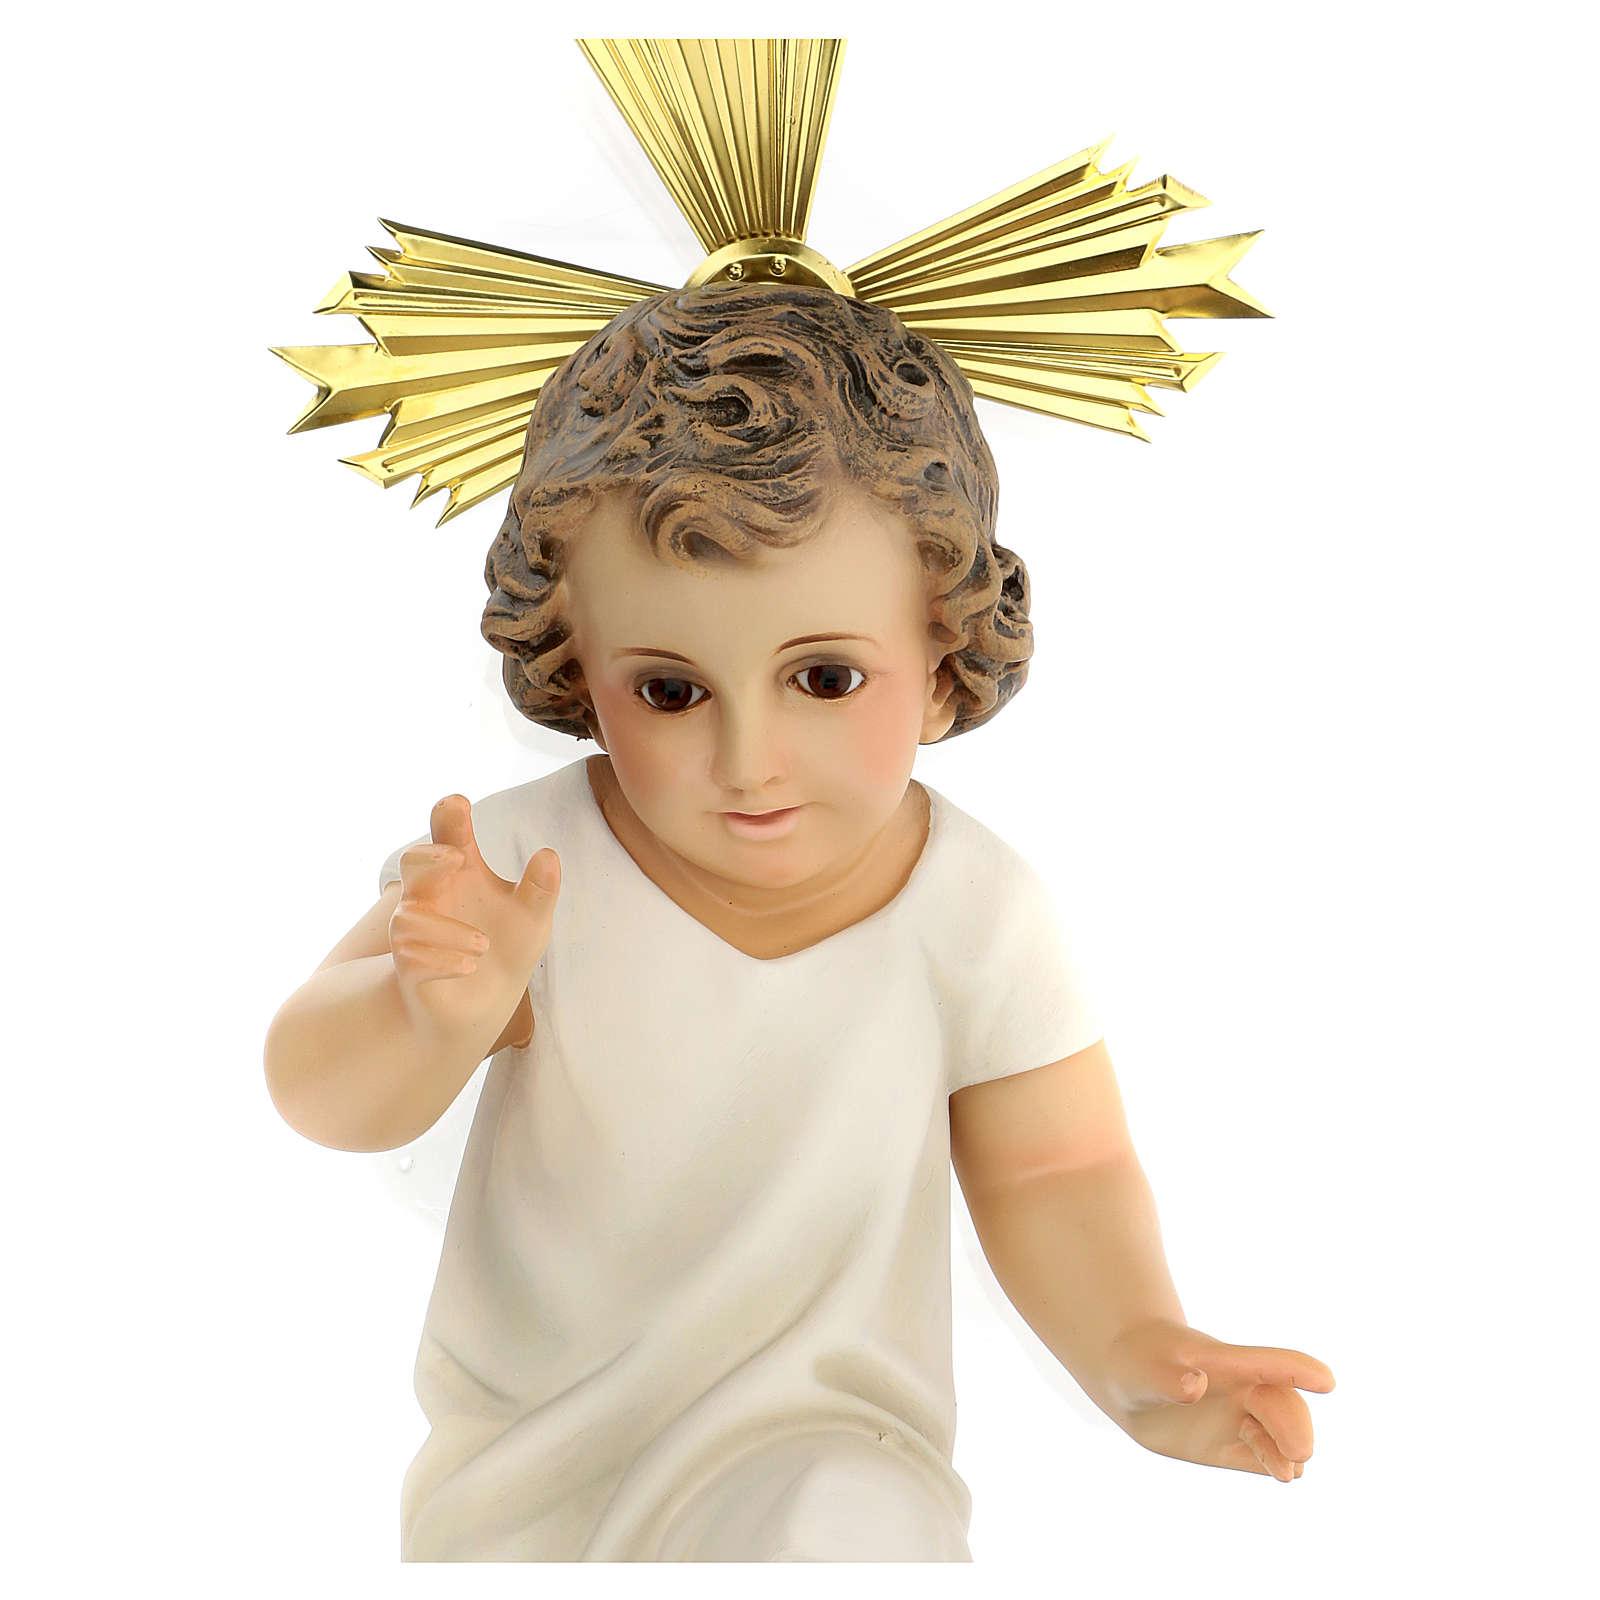 Niño Jesús estatua pulpa madera vestido crema 35 cm dec. elegante 3